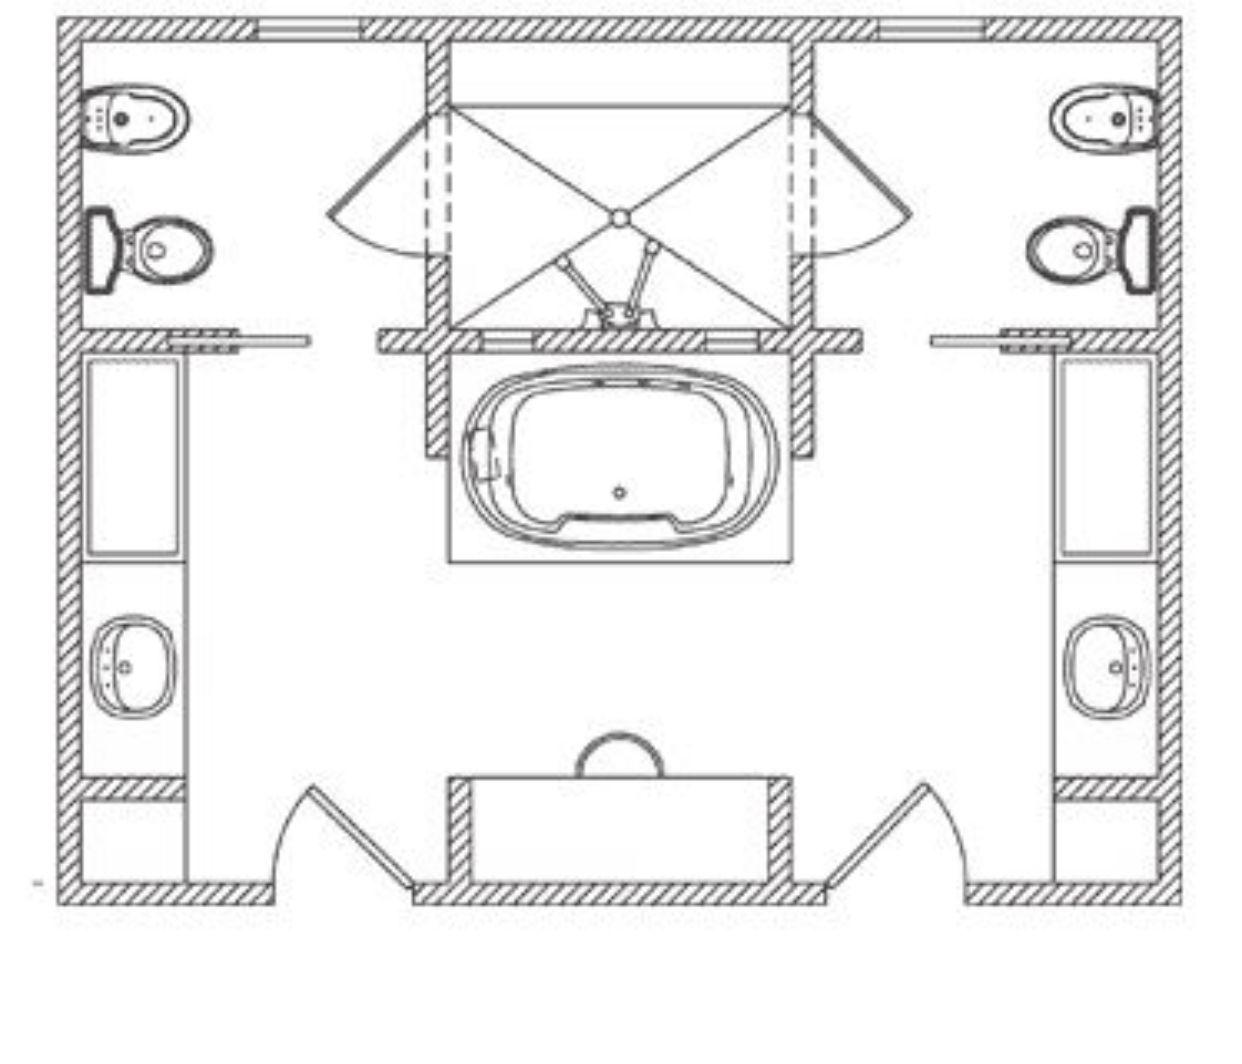 Bathroom Size And Space Arrangement Engineering Discoveries Bathroom Layout Plans Bathroom Shower Design Bathroom Floor Plans